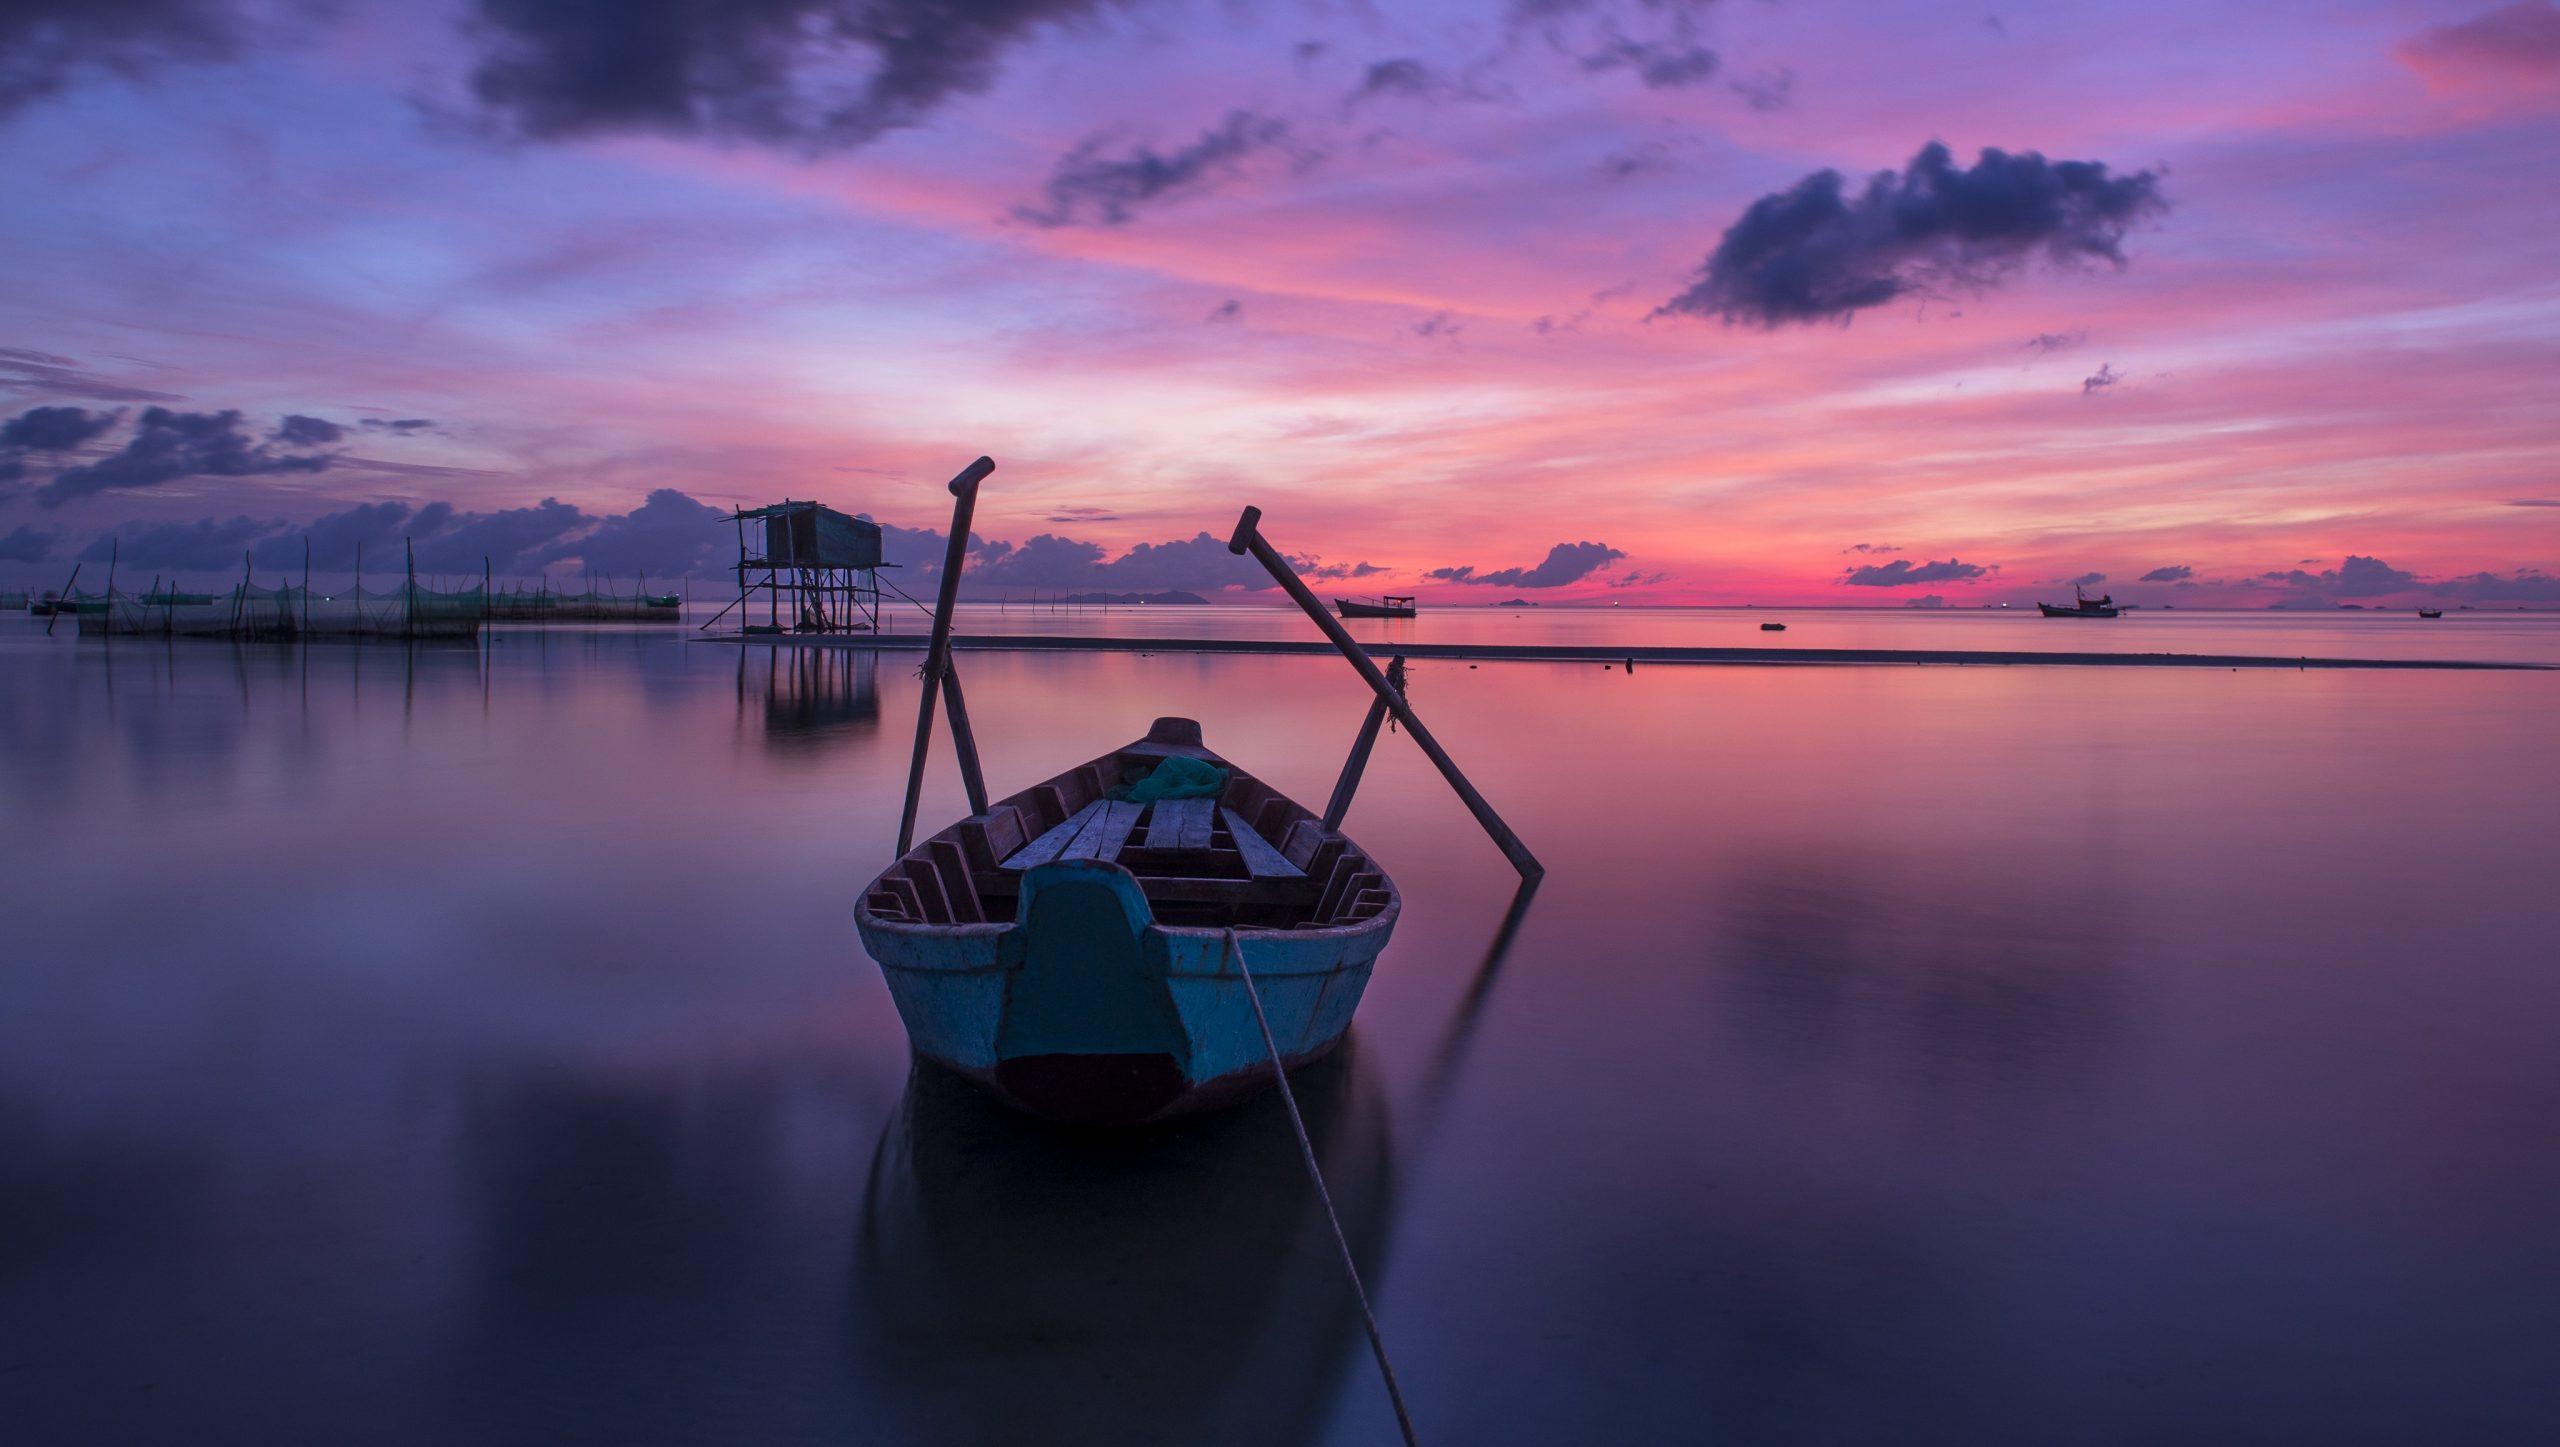 Sunset boat scene.